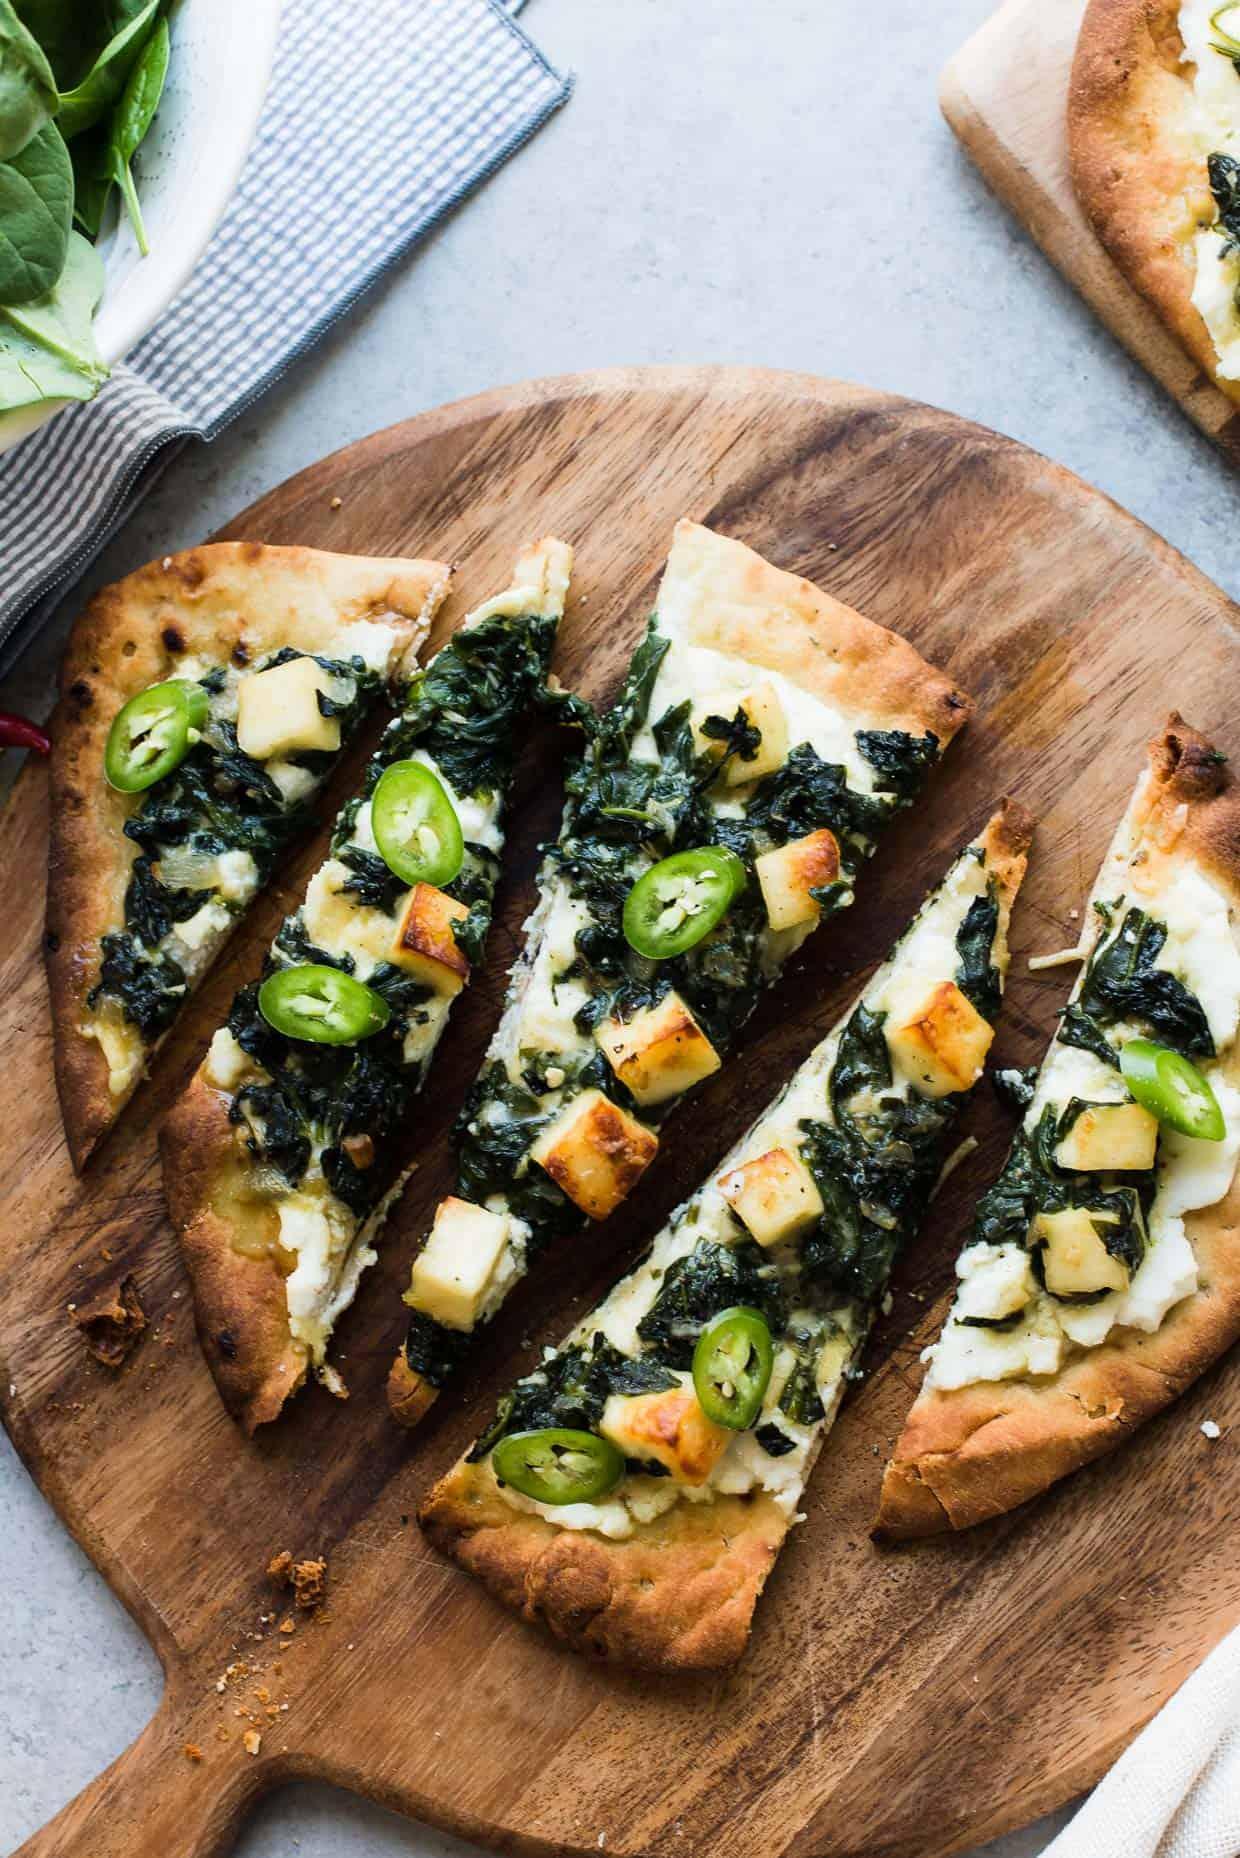 Slices of Saag Paneer Naan Pizza.